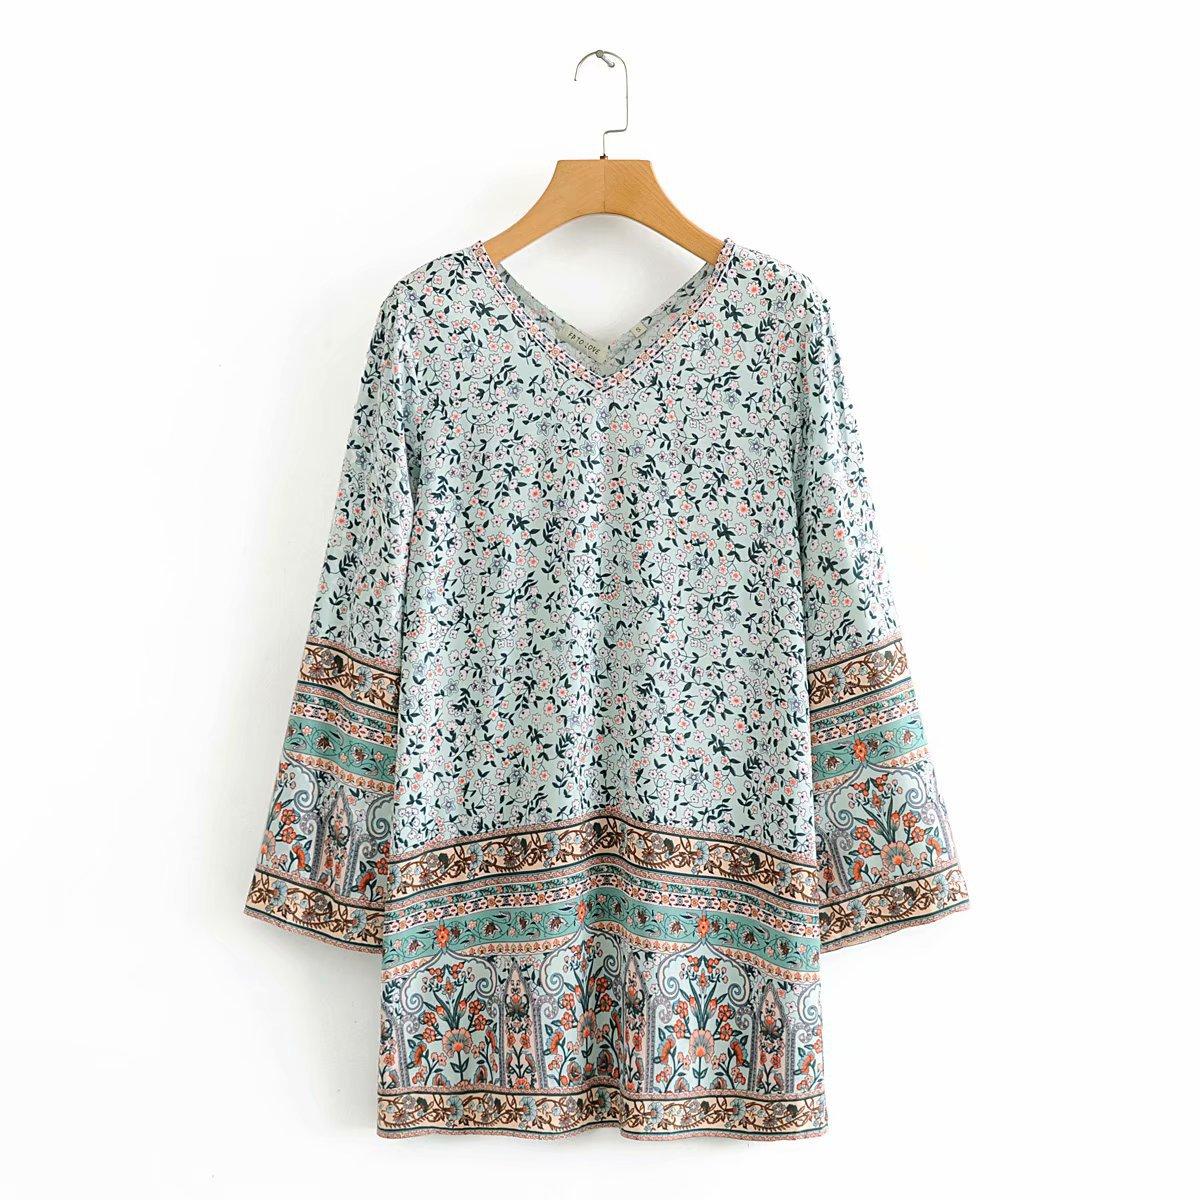 2020 New Spring Summer New Style European Green Shivering Short Female Dress Zaraing Vadiming Sheining Women Dress WDD60337